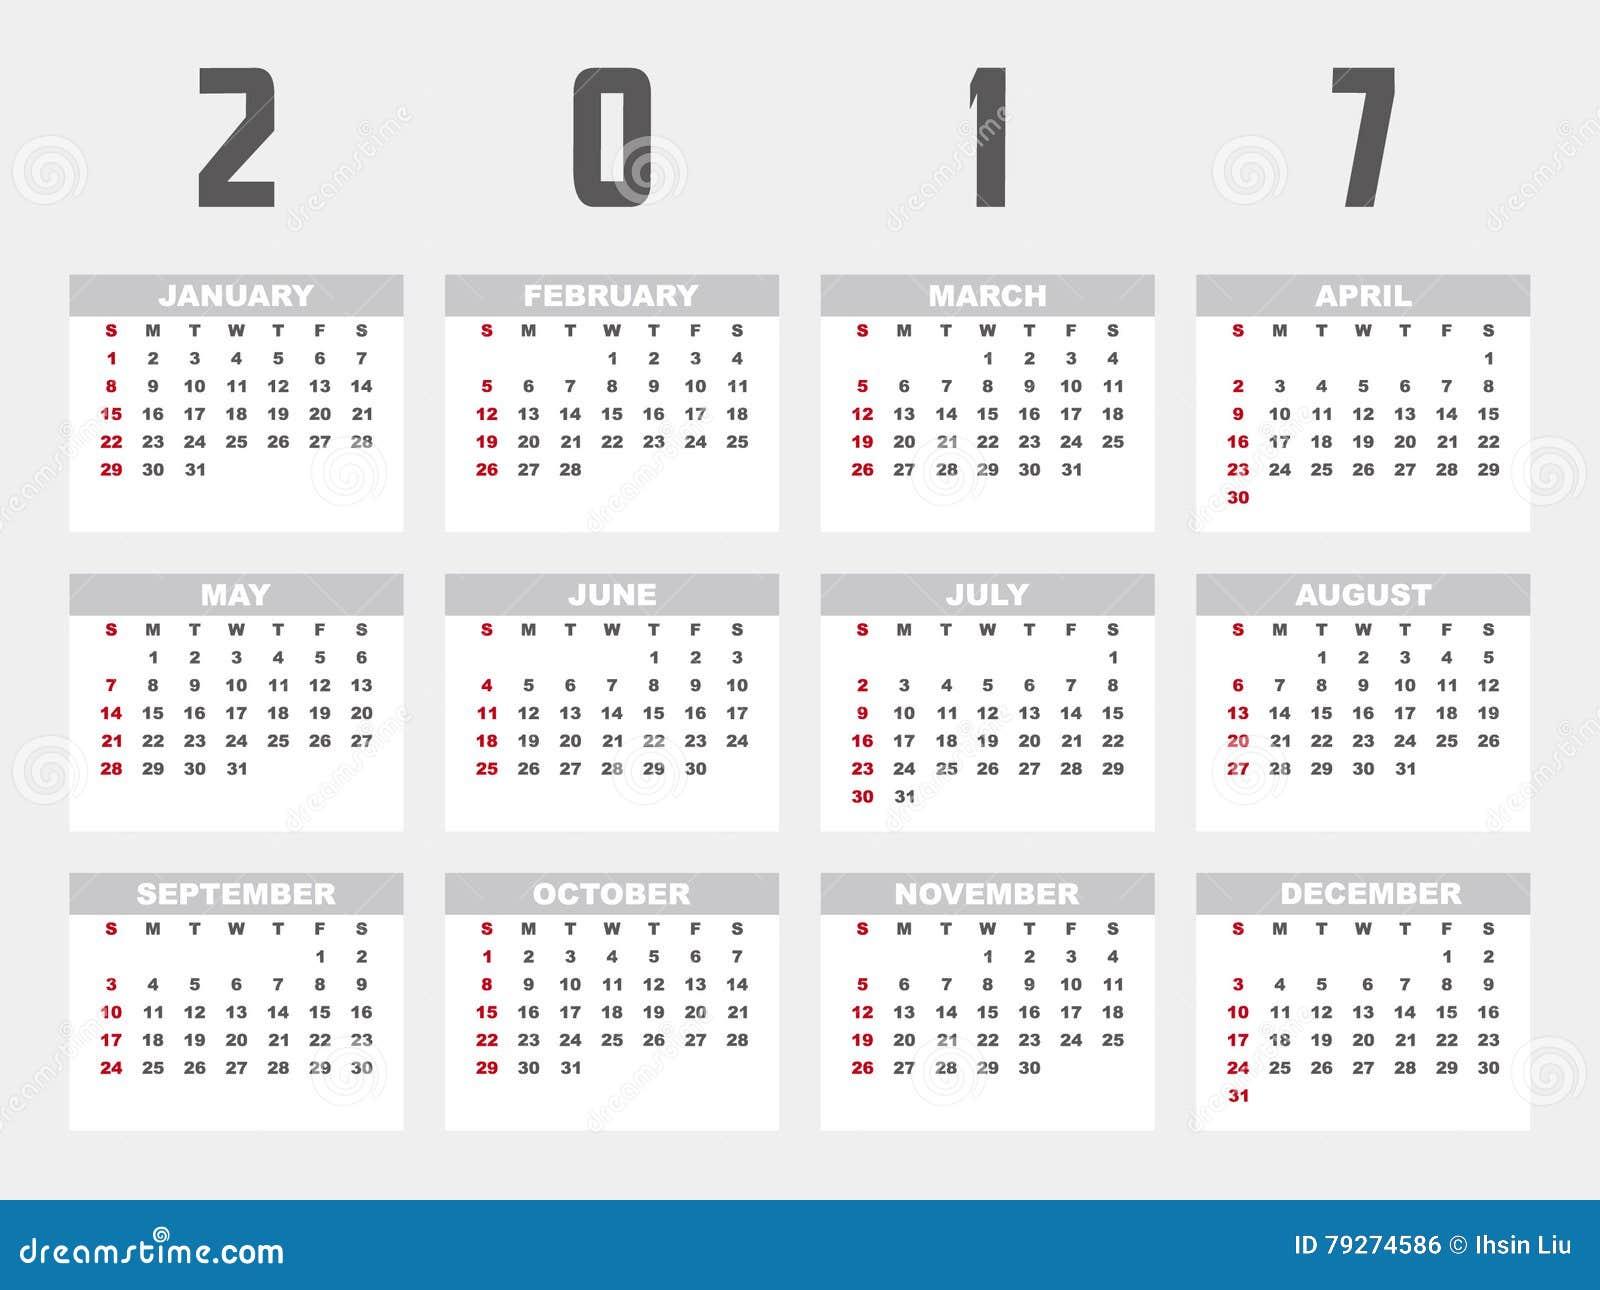 Calendar Design Illustrator : Planner design stock vector image